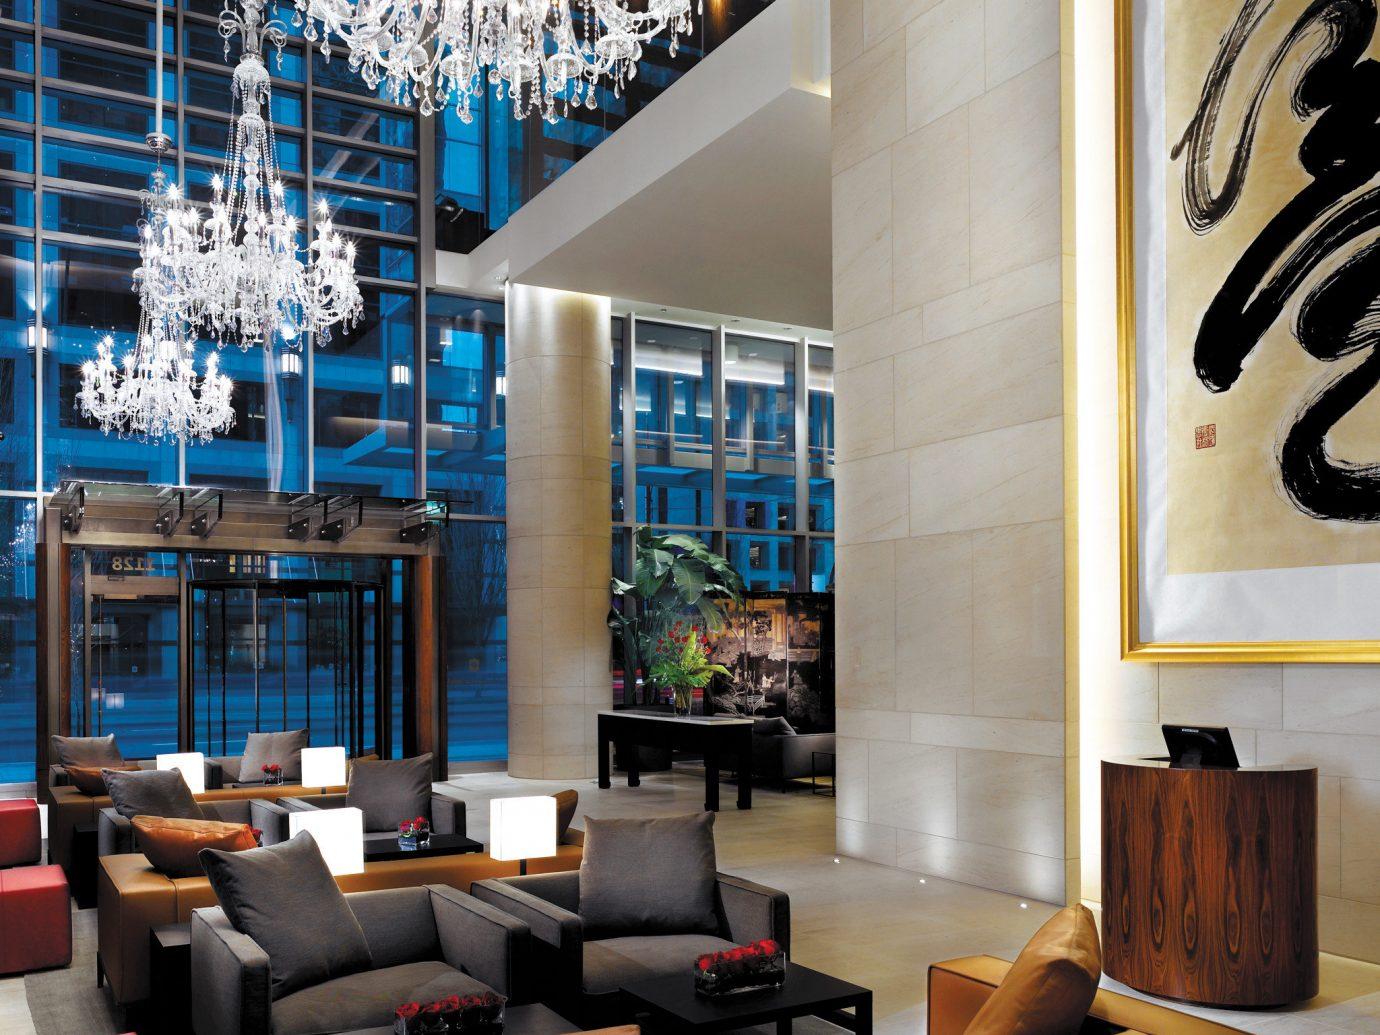 Hip Hotels Living Lounge Luxury Modern indoor room living room Lobby interior design lighting modern art Design furniture window covering area